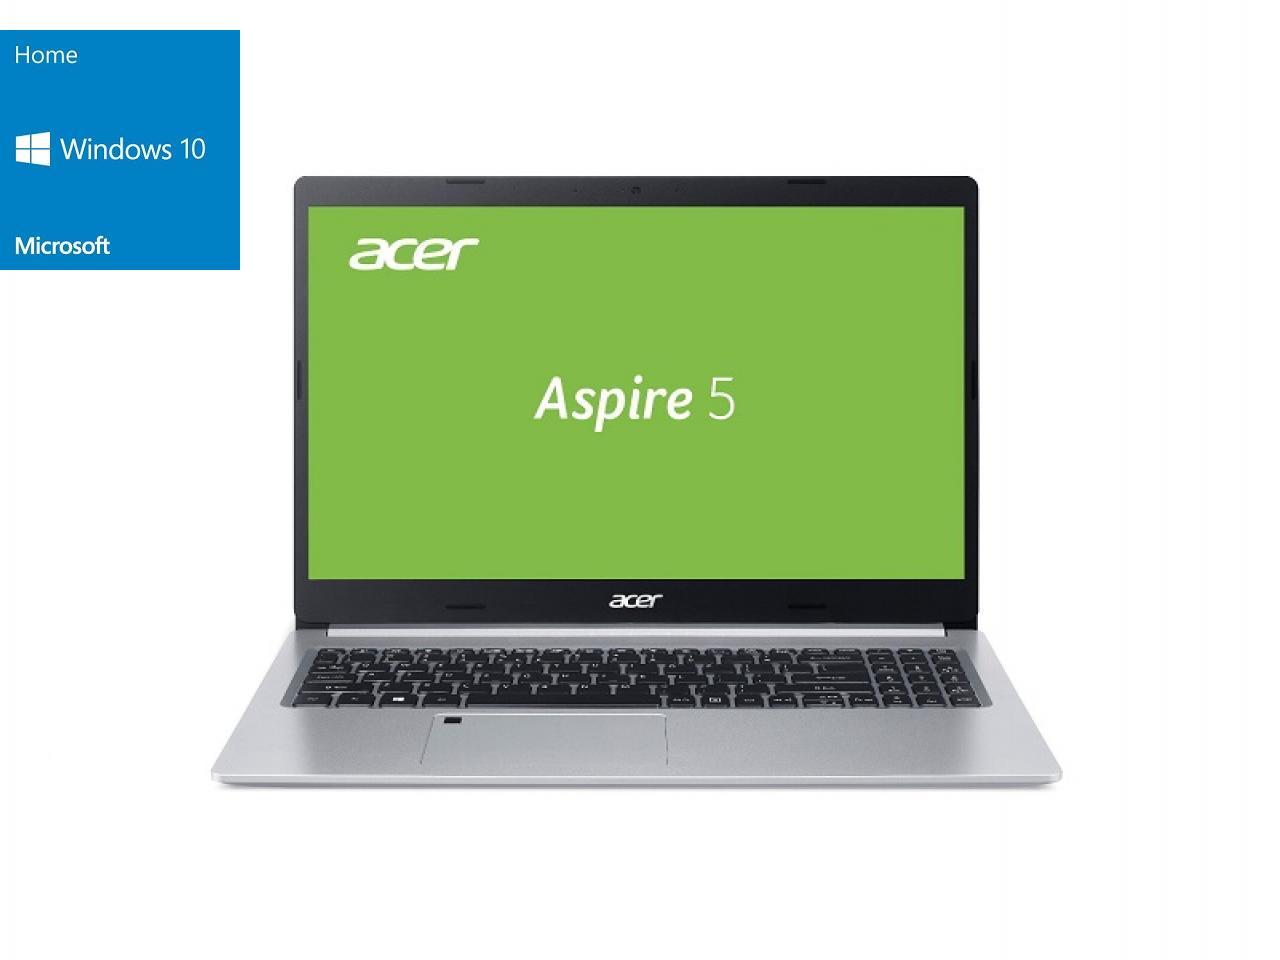 Acer Aspire 5 A515-55  - shop.bb-net.de